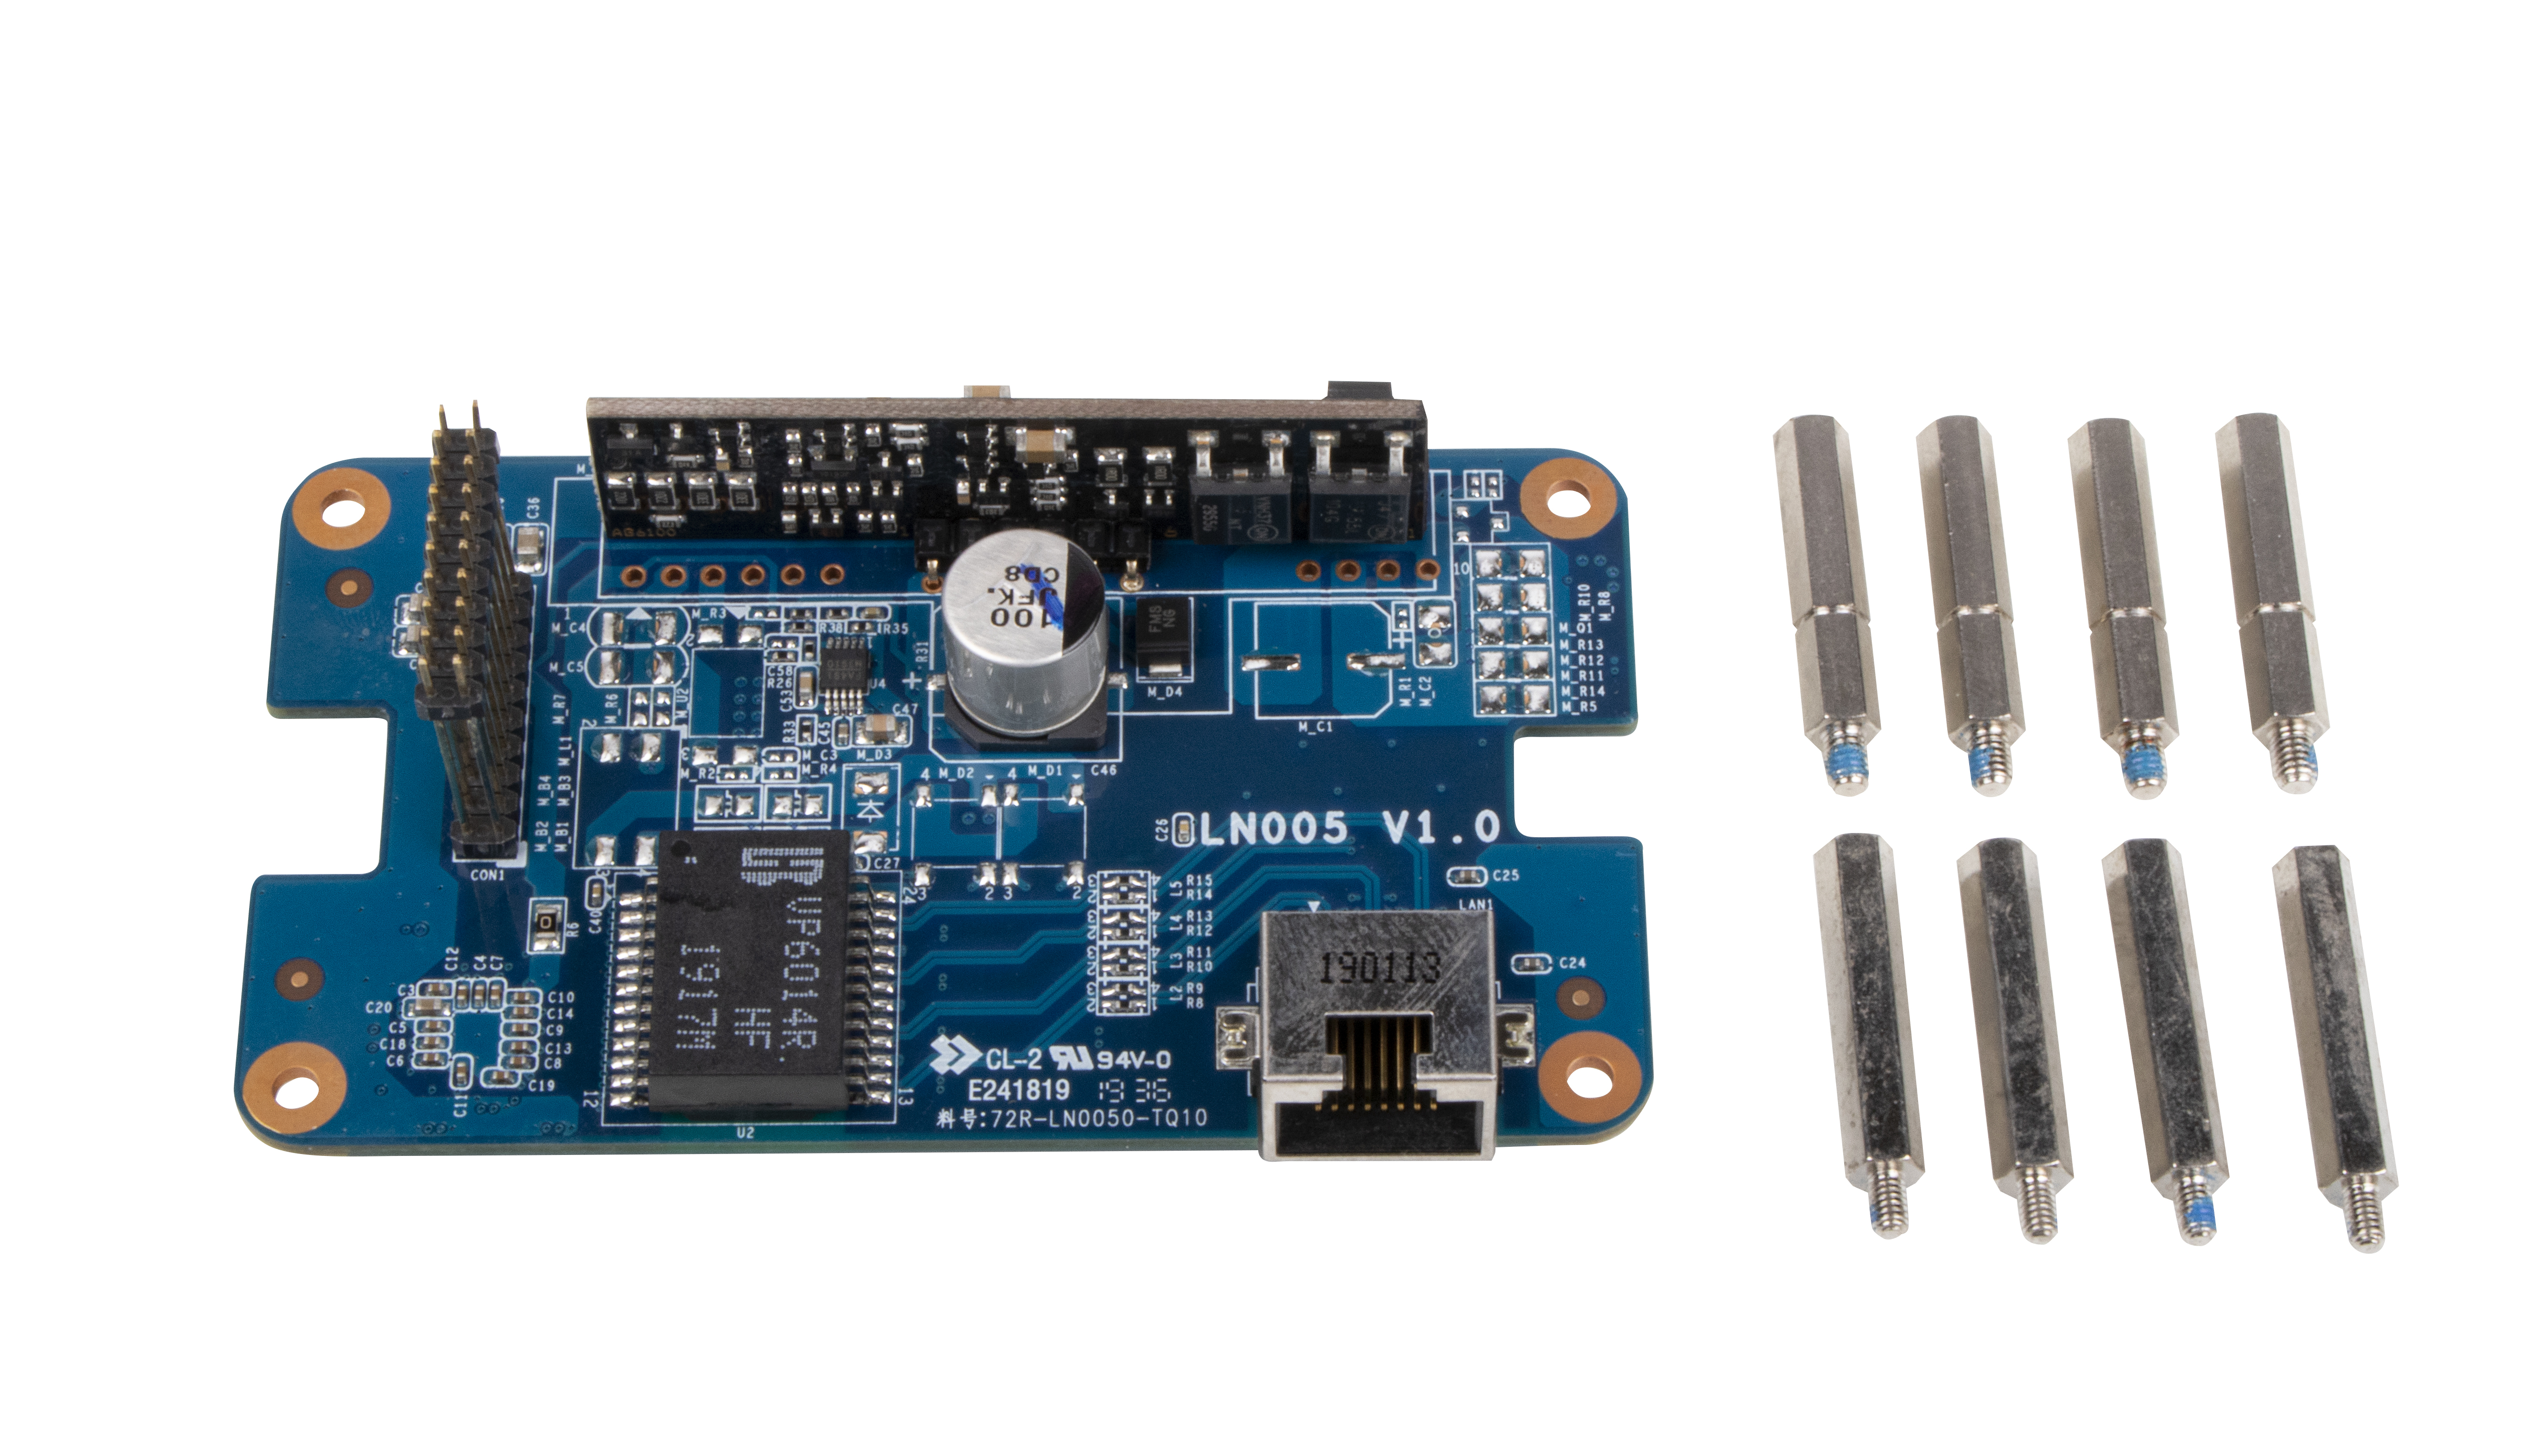 Shuttle PSE01 Gigabit LAN with PoE Output (Power Out) - Eingebaut - Verkabelt - Ethernet - Schwarz - Blau